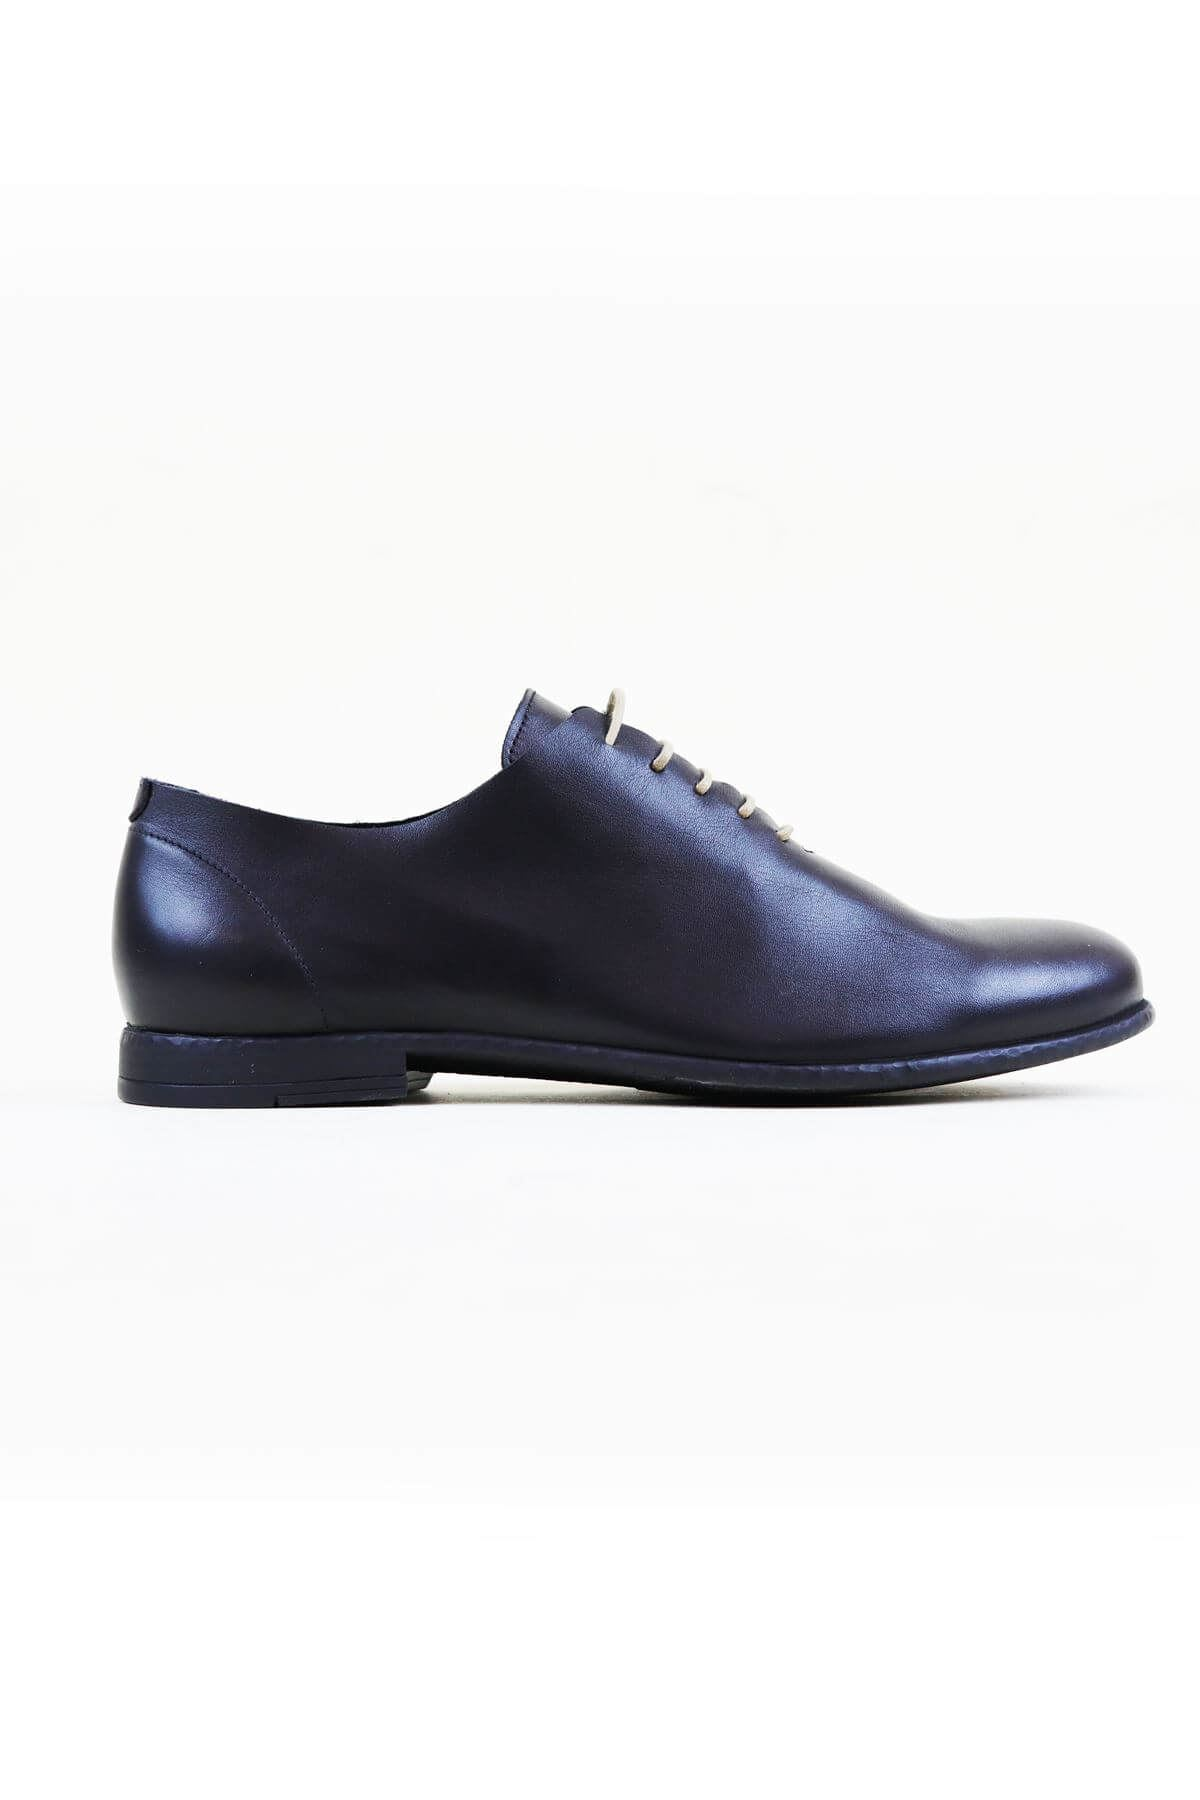 Free Foot 20350 Siyah Hakiki Deri Erkek Ayakkabısı